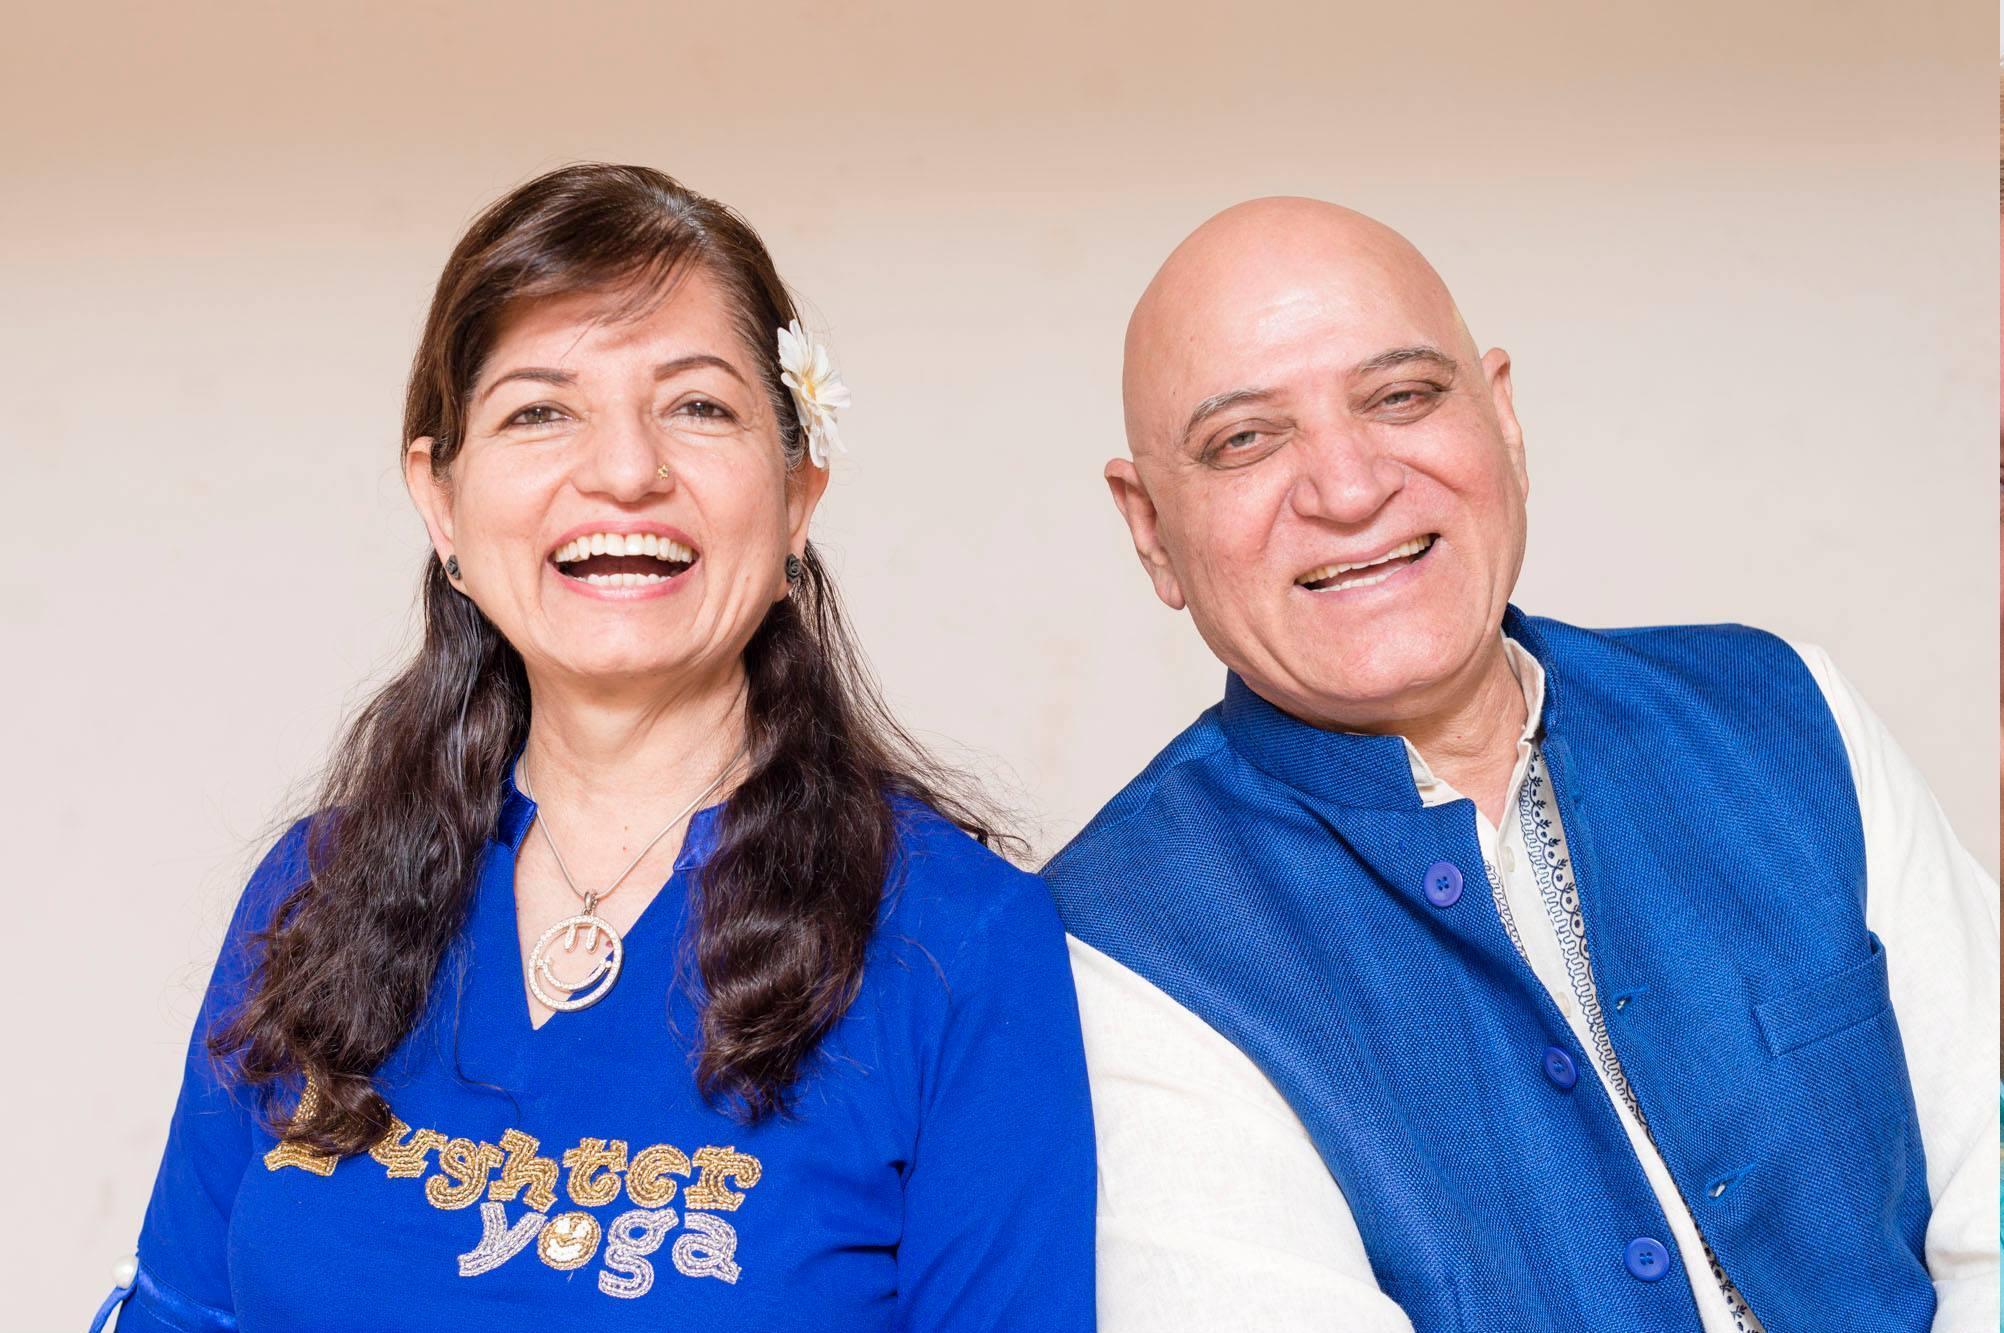 Madhuri & Dr. Madan Kataria, founders of the global laughter yoga movement.